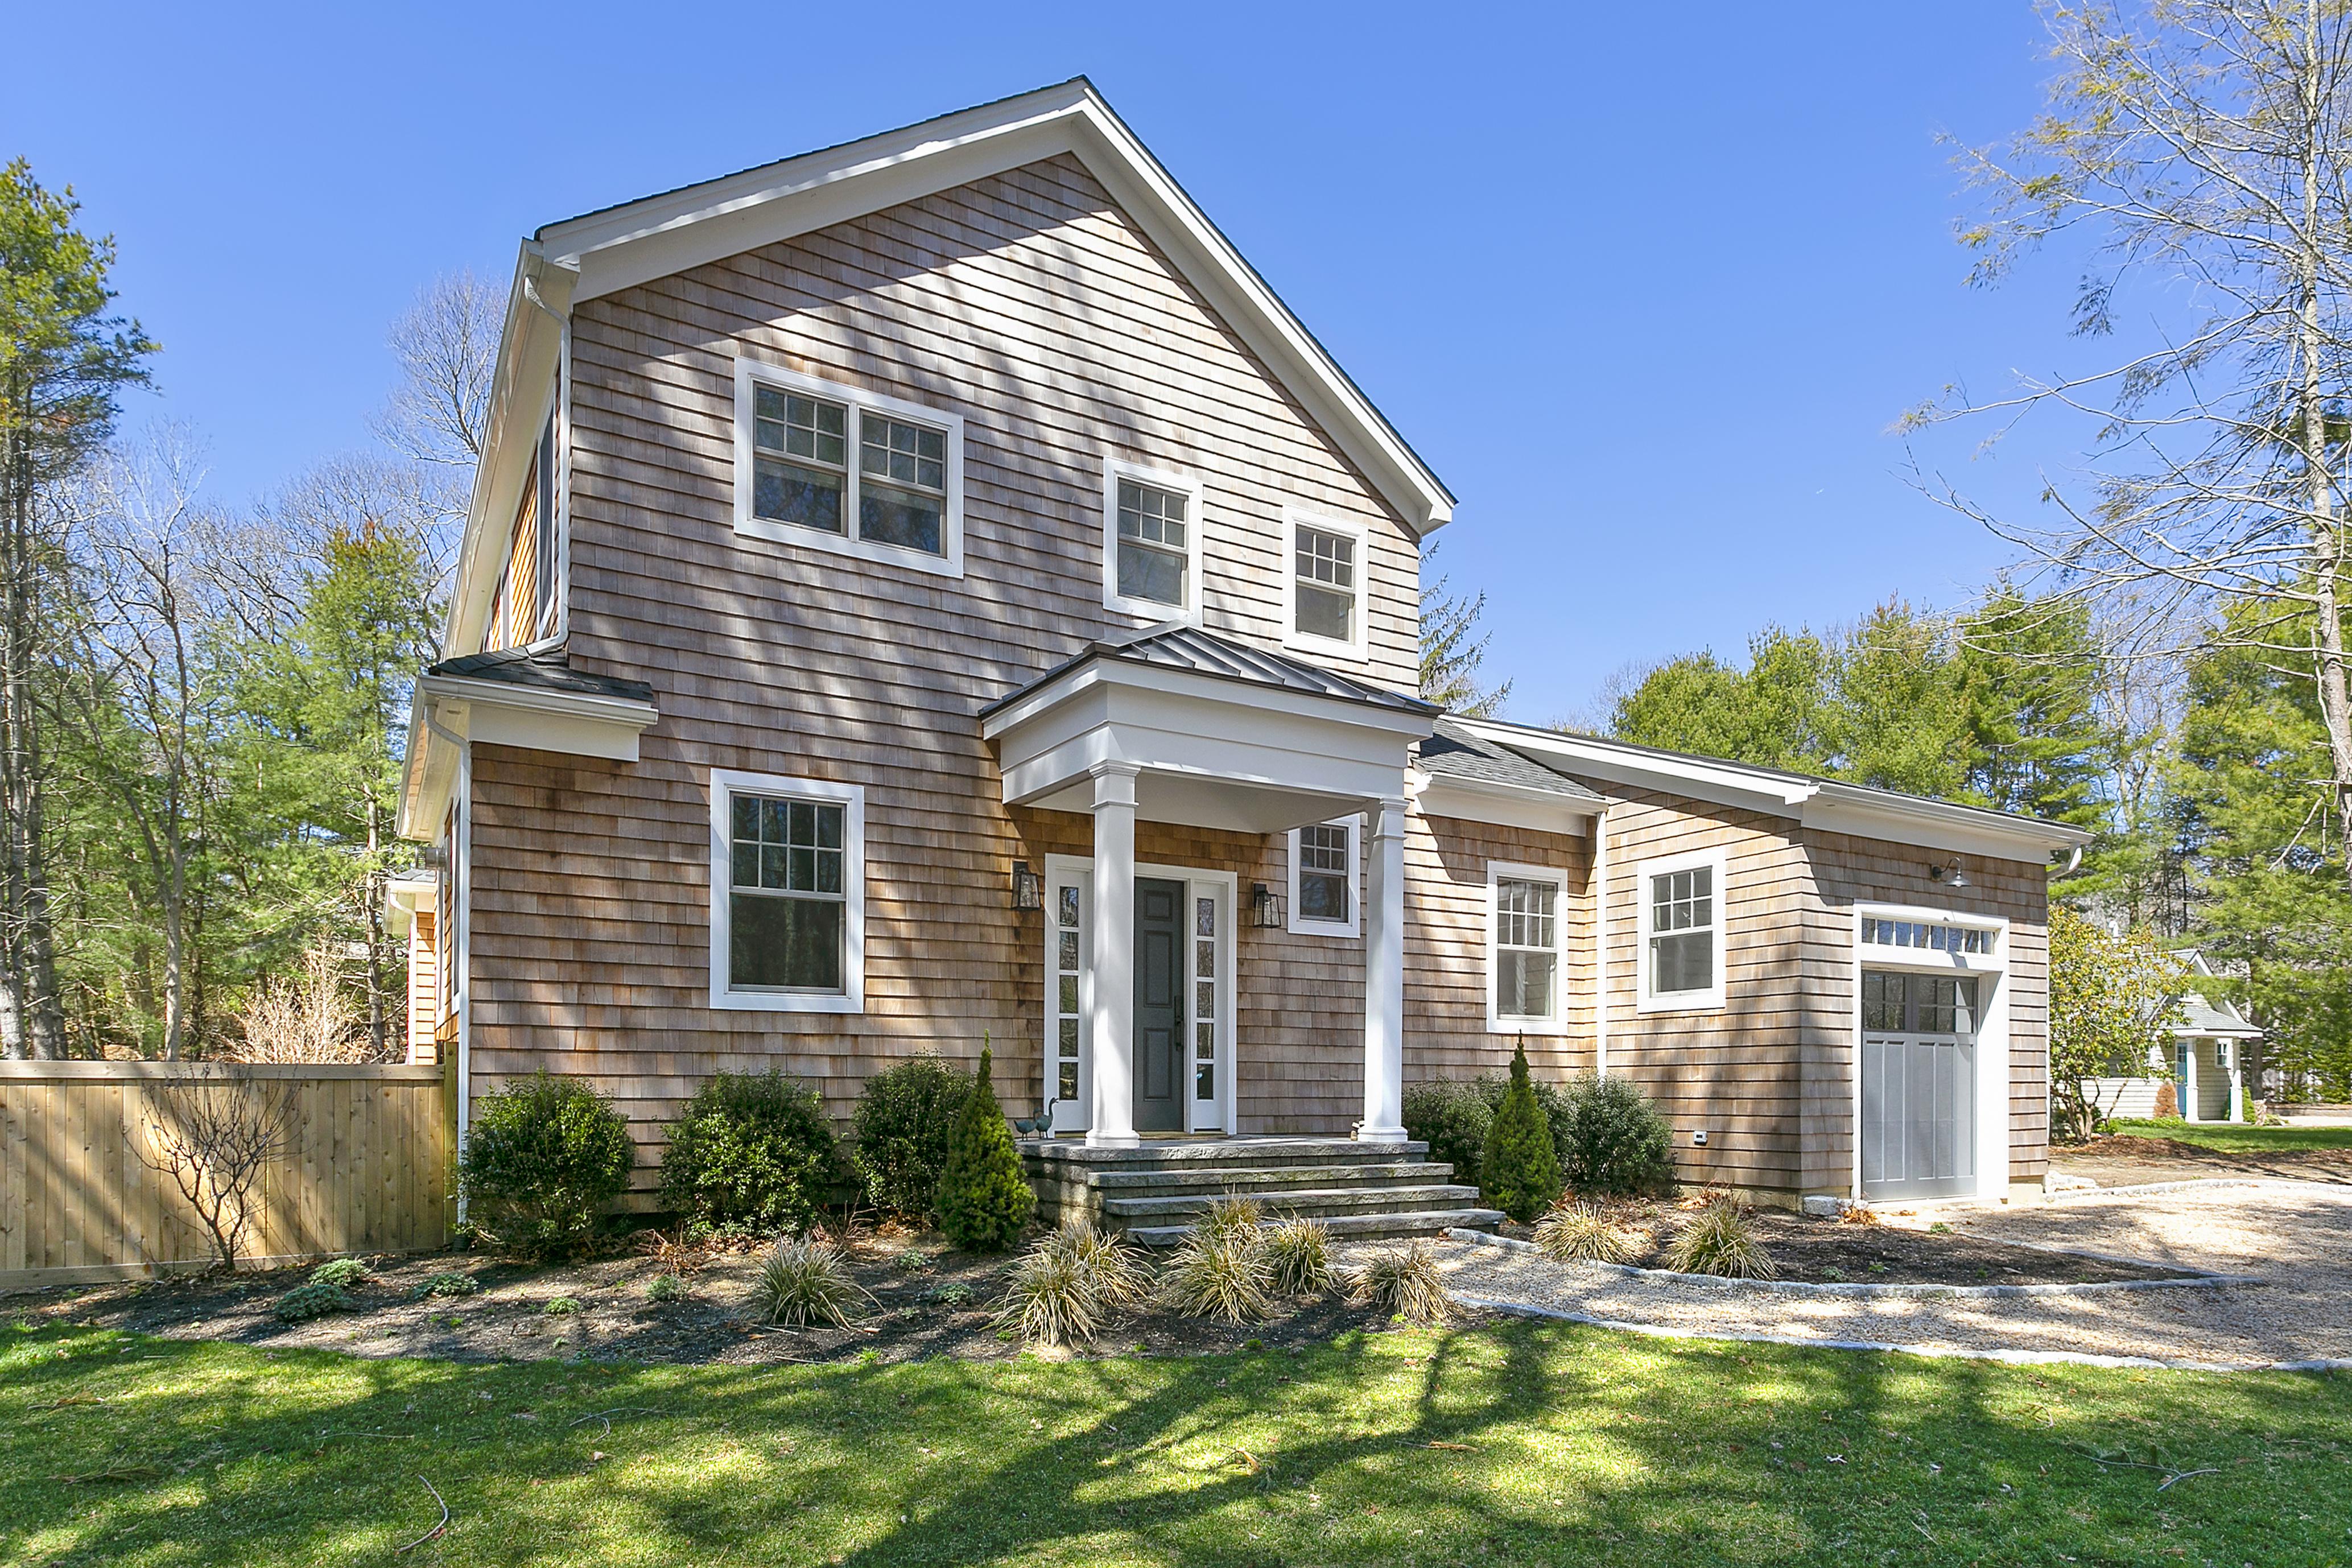 97 Oak Ln - Amagansett North, New York